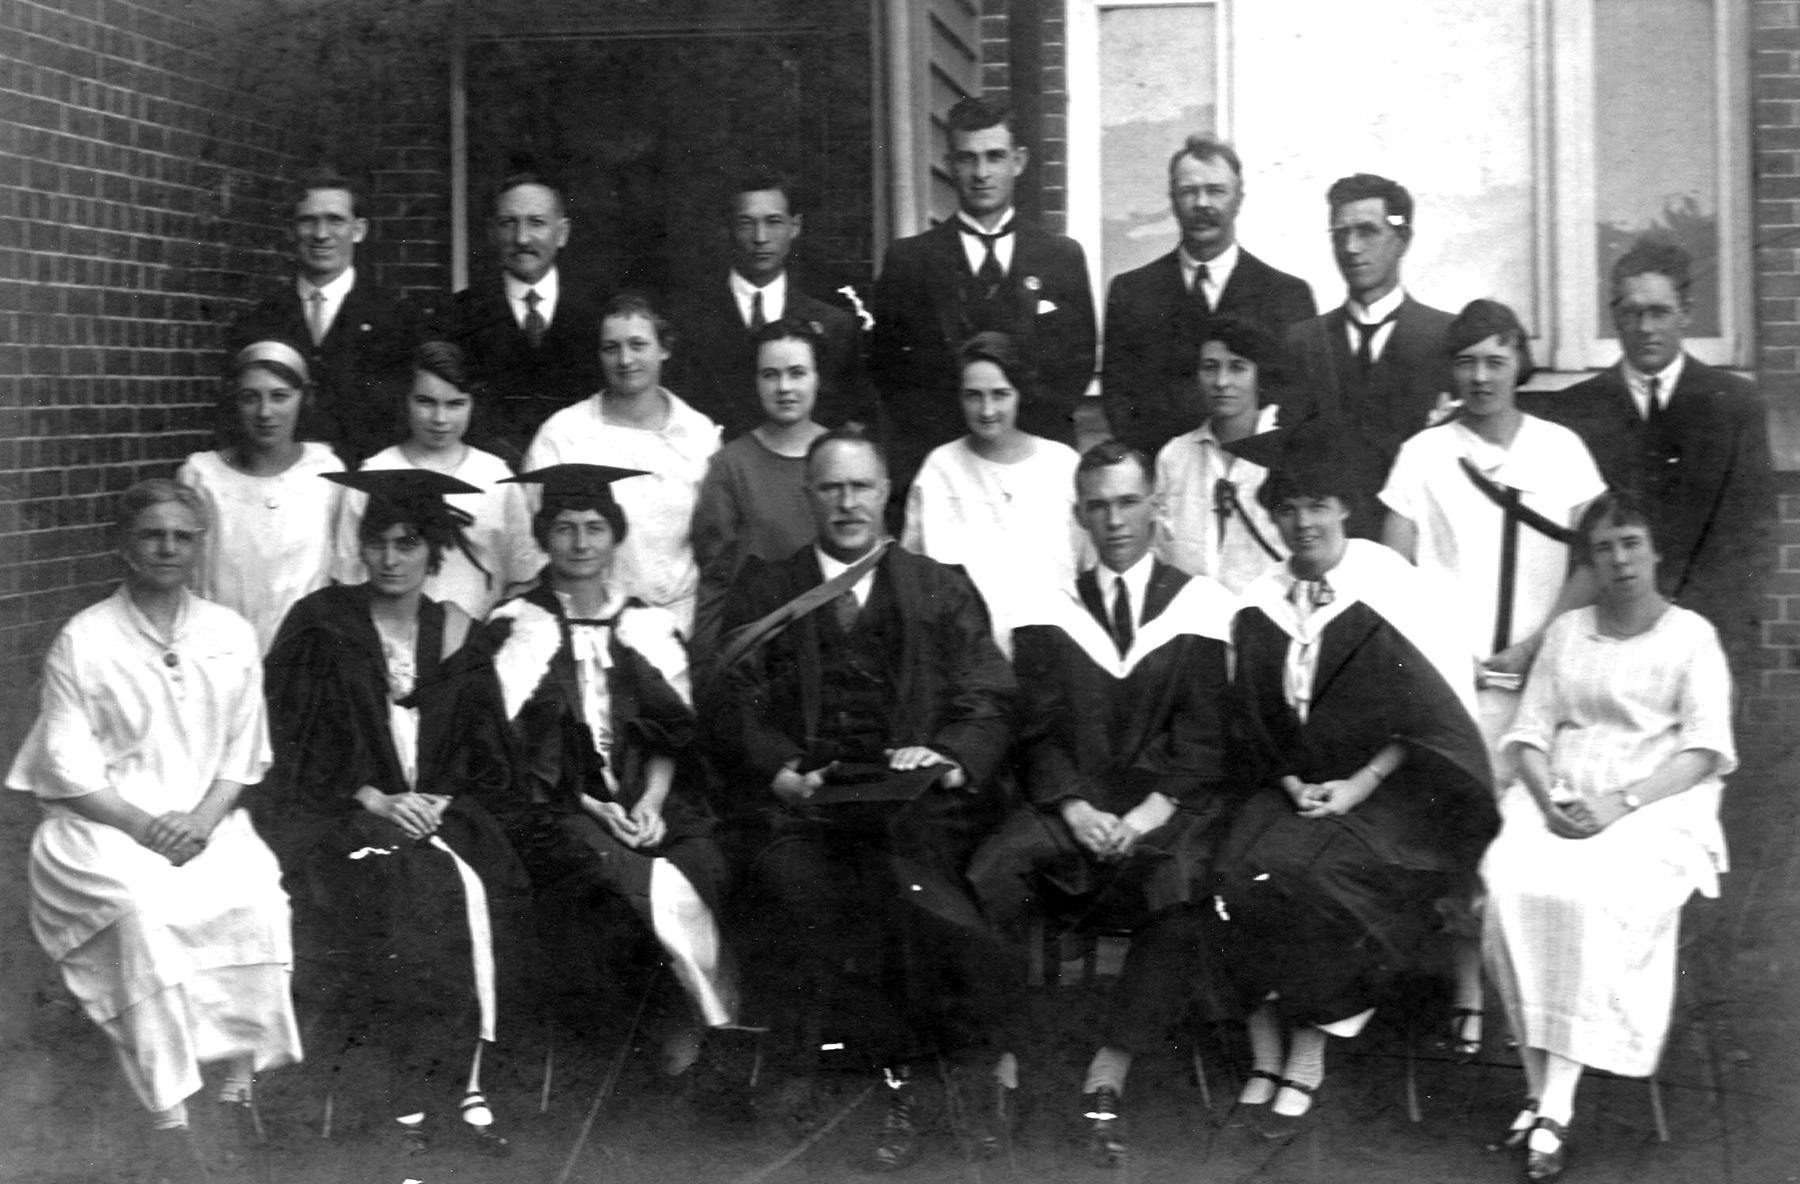 Staff photo 1927